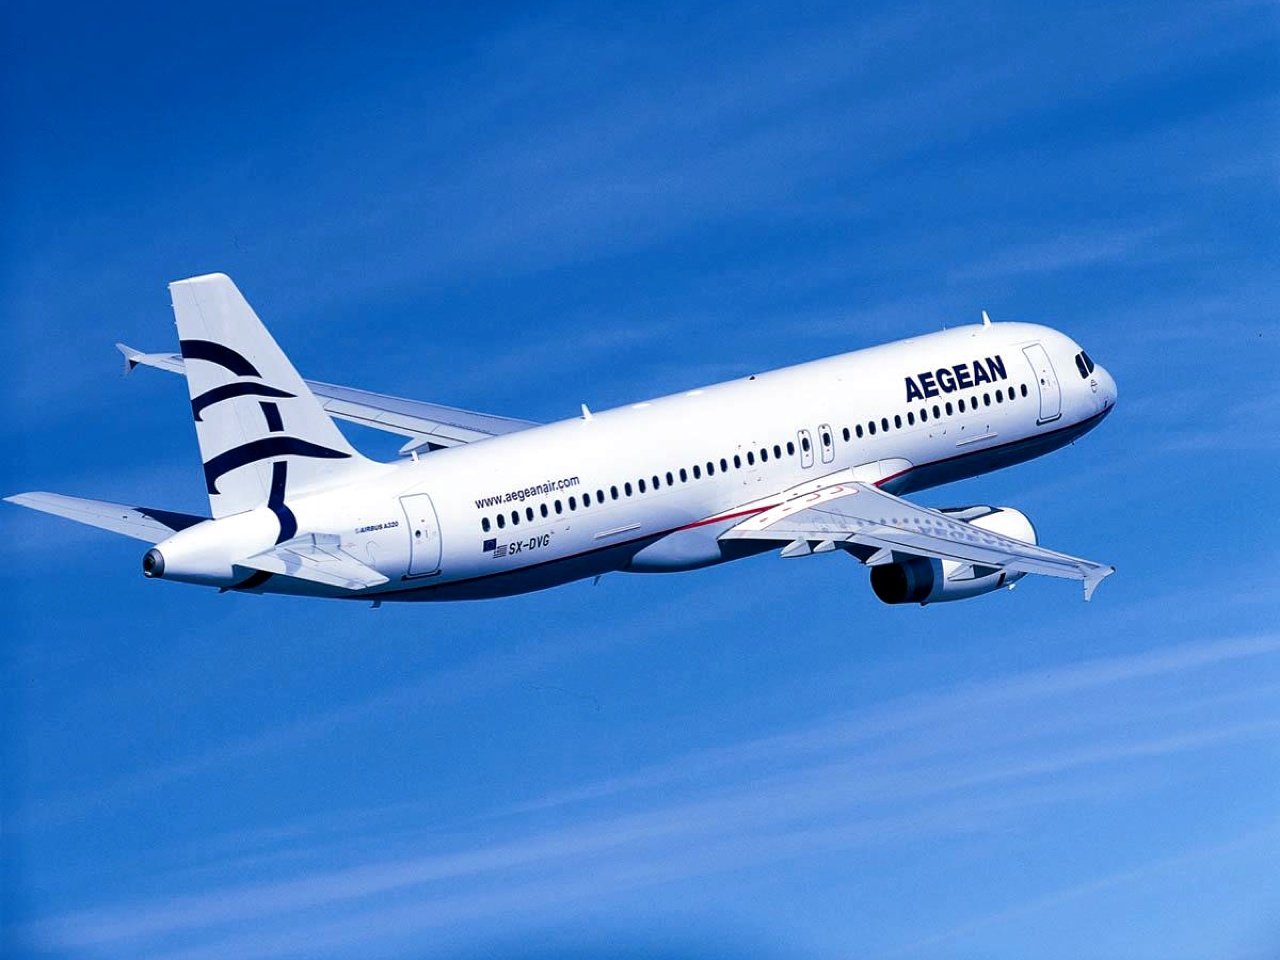 AEGEAN Tops TripAdvisor List as Europe's Best Regional Airline for 2018